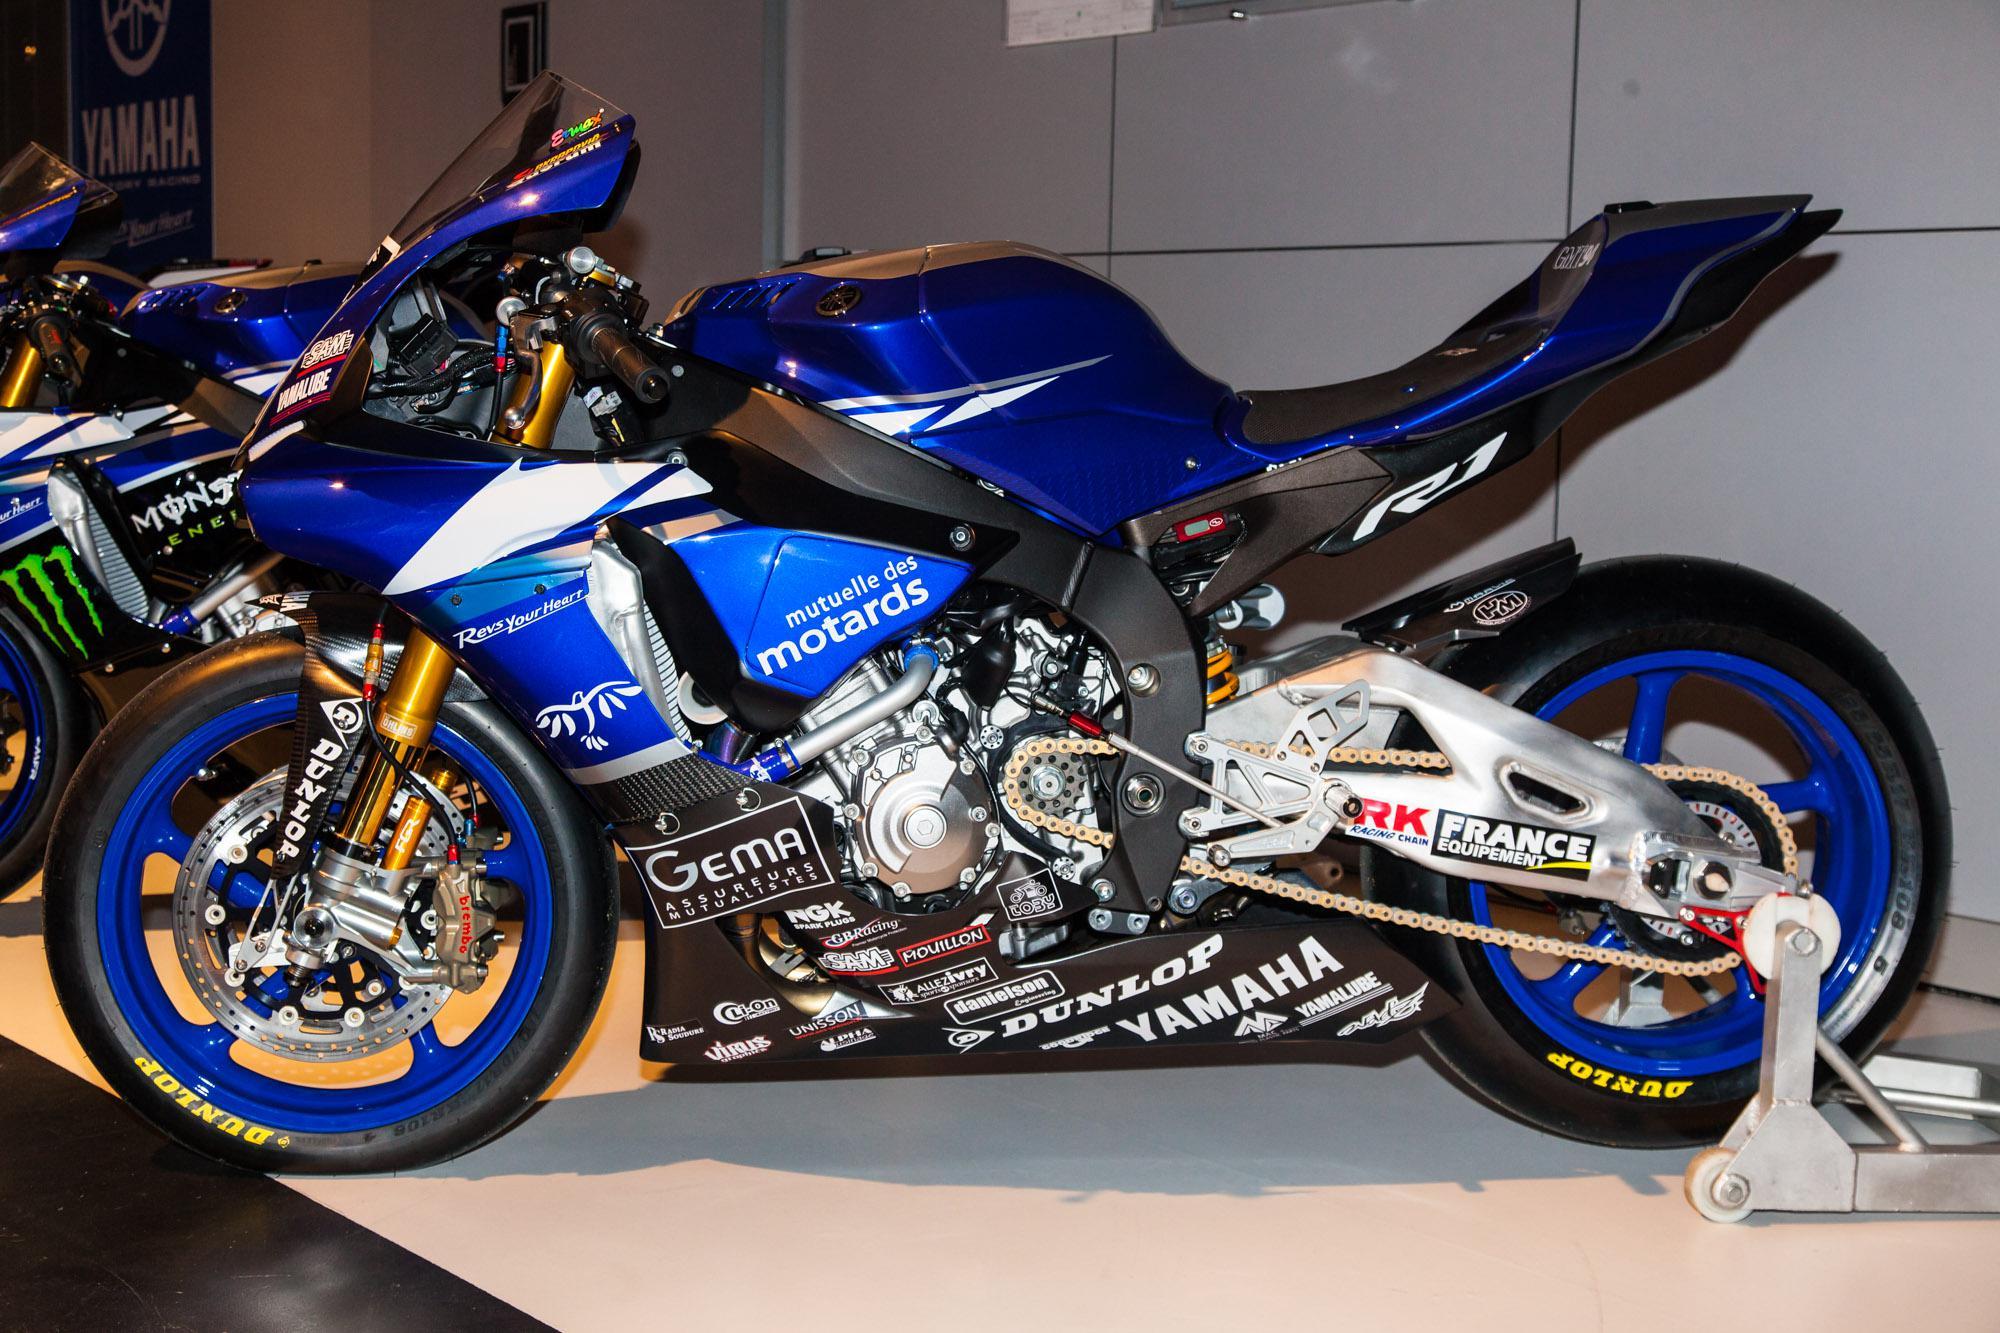 Yamaha YZF-R1 Factory Racing Teams 2015 Motorrad Fotos ...